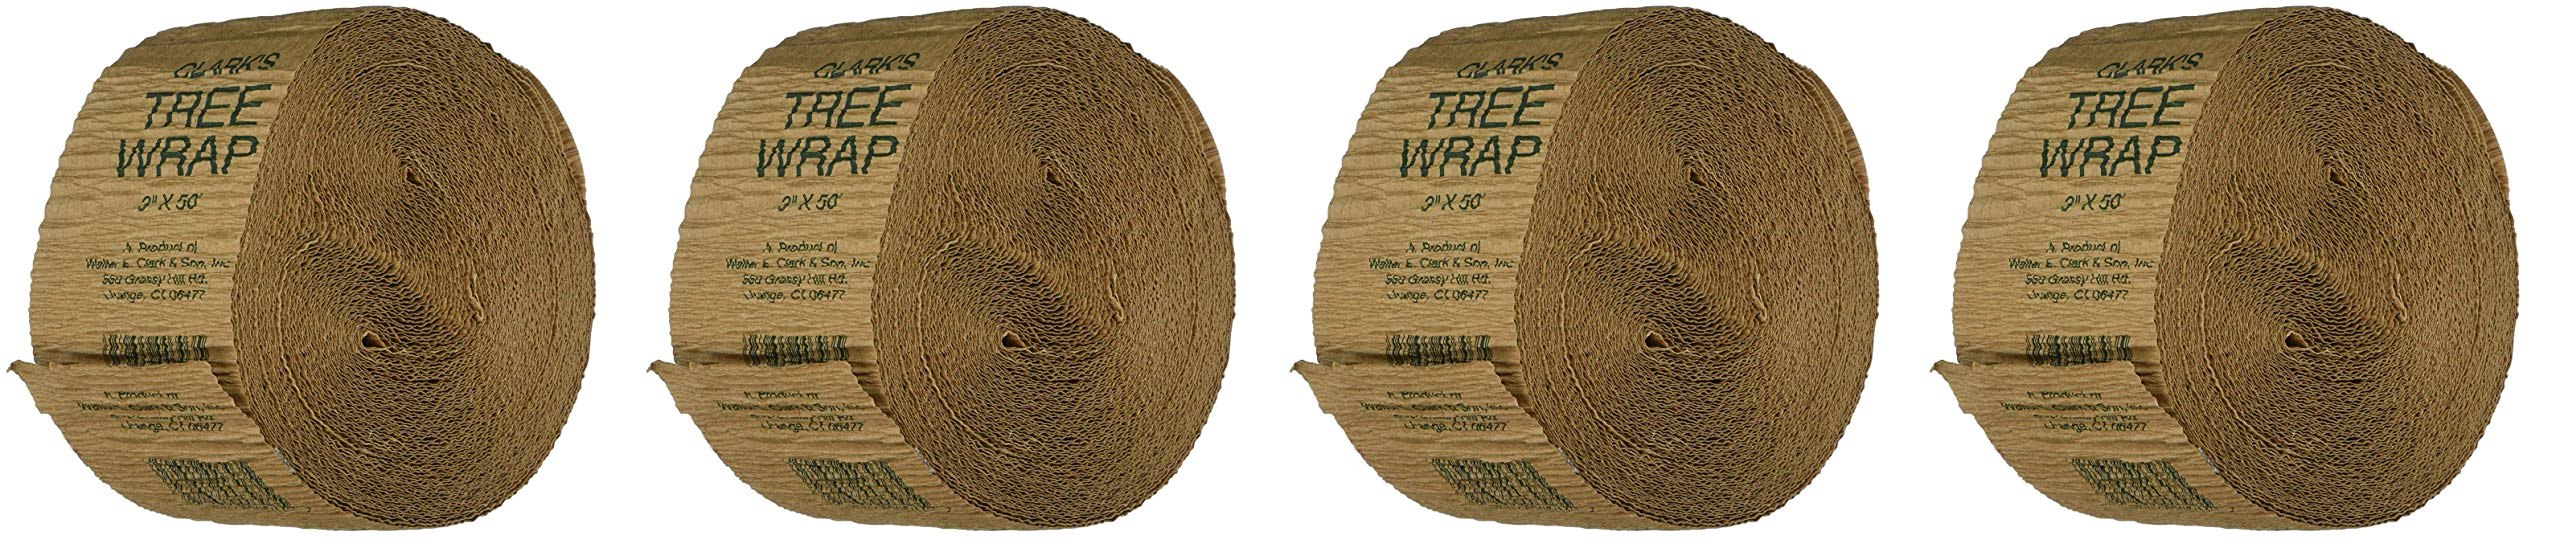 Walter E Clark 3-Inch by 50-Foot Tree Wrap 00303 (Fоur Расk) by Walter E Clark